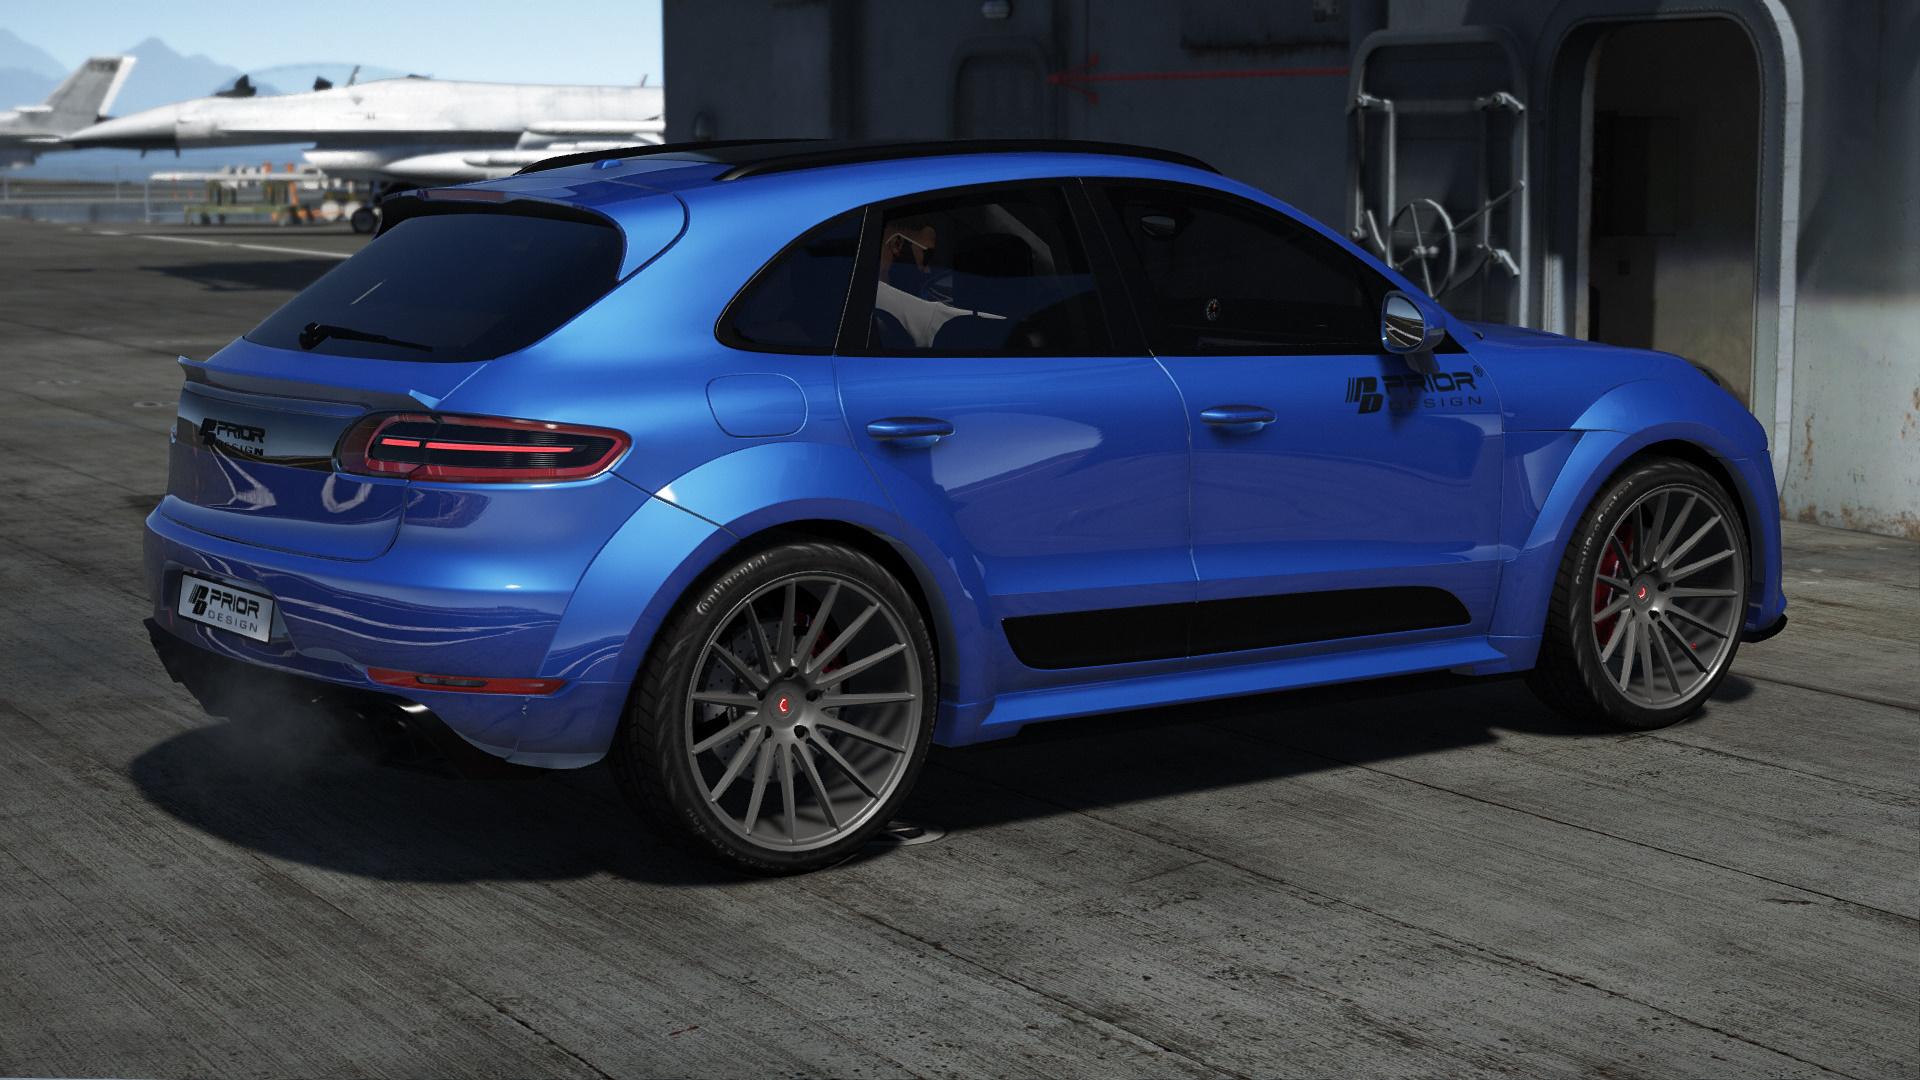 Porsche Macan Forum >> Porsche Macan Prior Design.[Addon] - GTA5-Mods.com